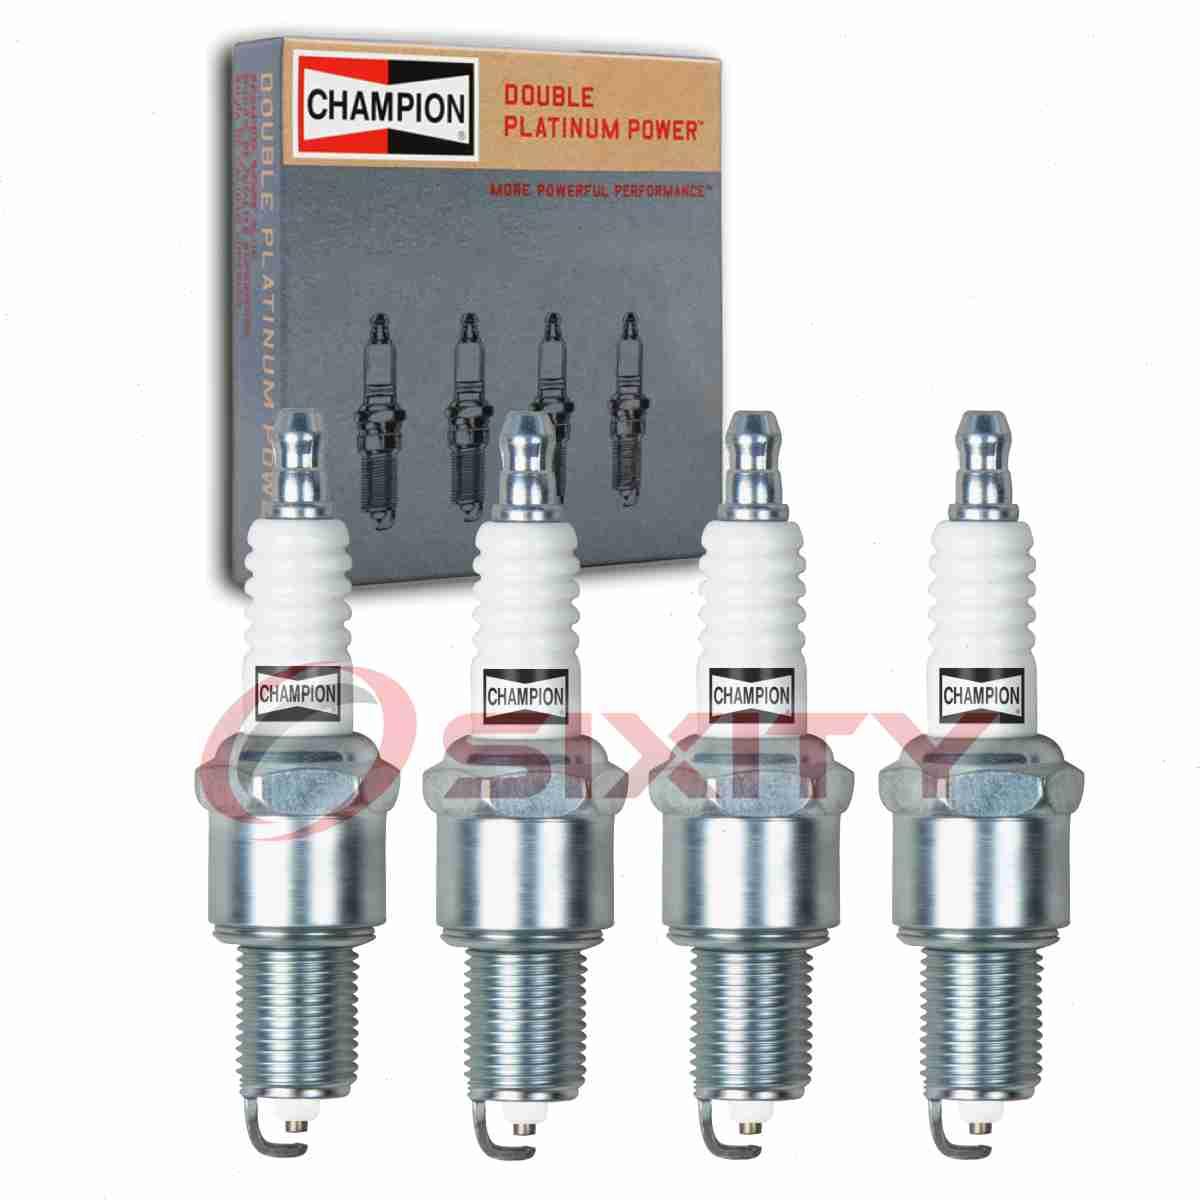 6x Champion Spark Plug RE10PMC5